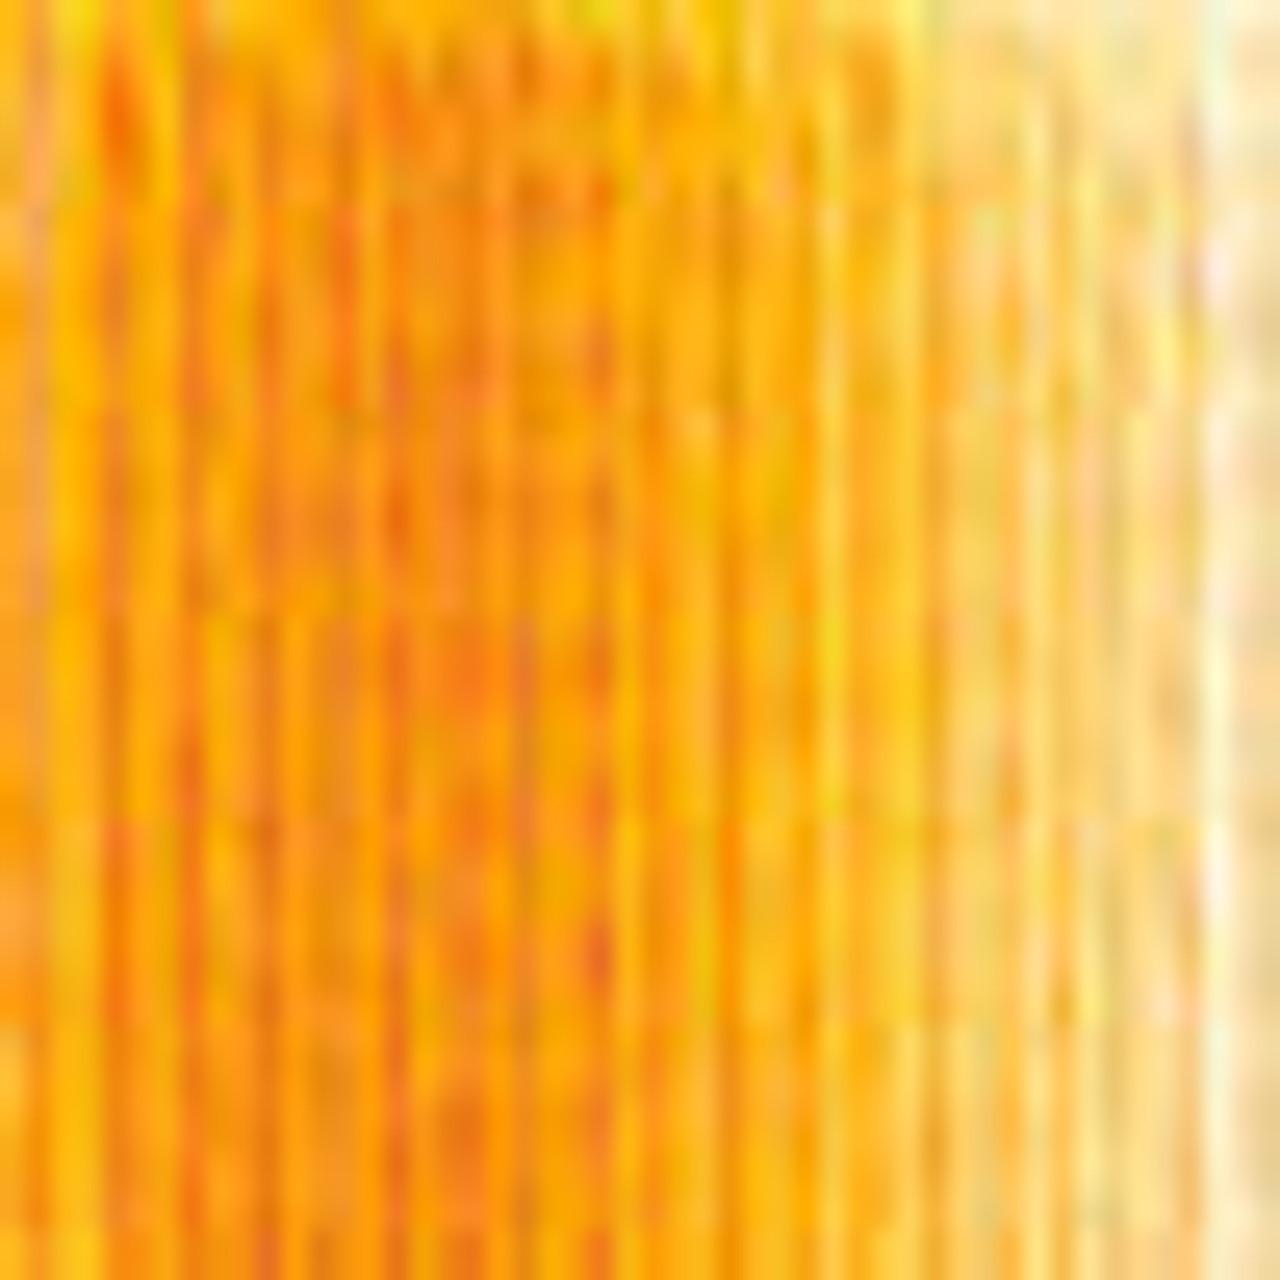 DMC # 90 Variegated Yellow  Floss / Thread